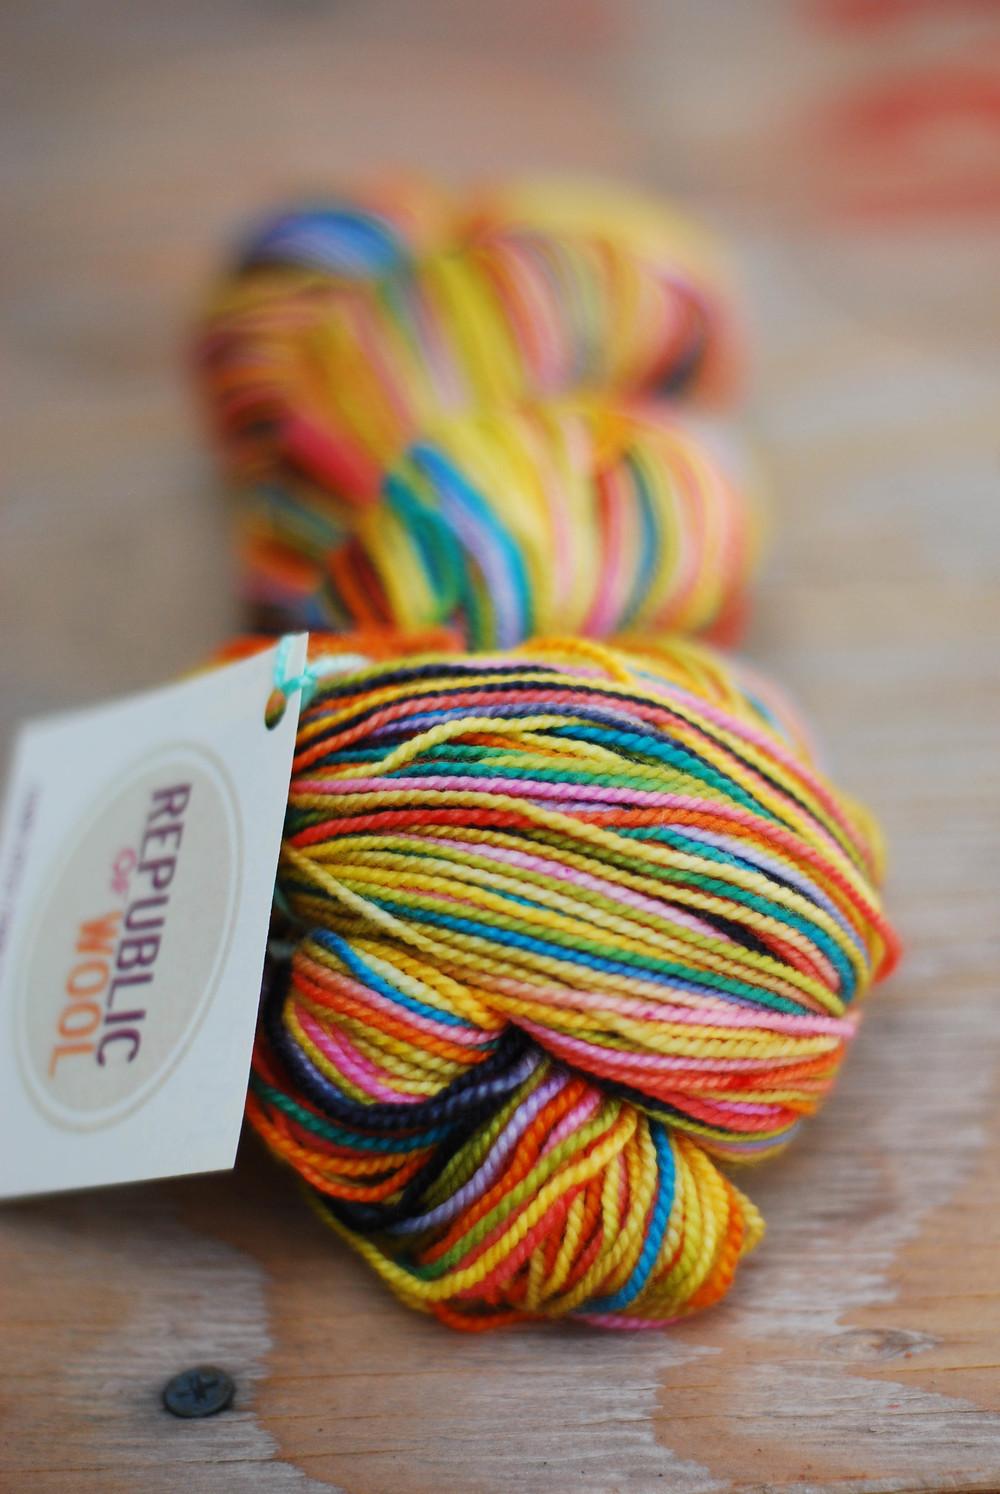 Book Cover Watercolor Yarn : Sock yarn book covers — hey porkchop